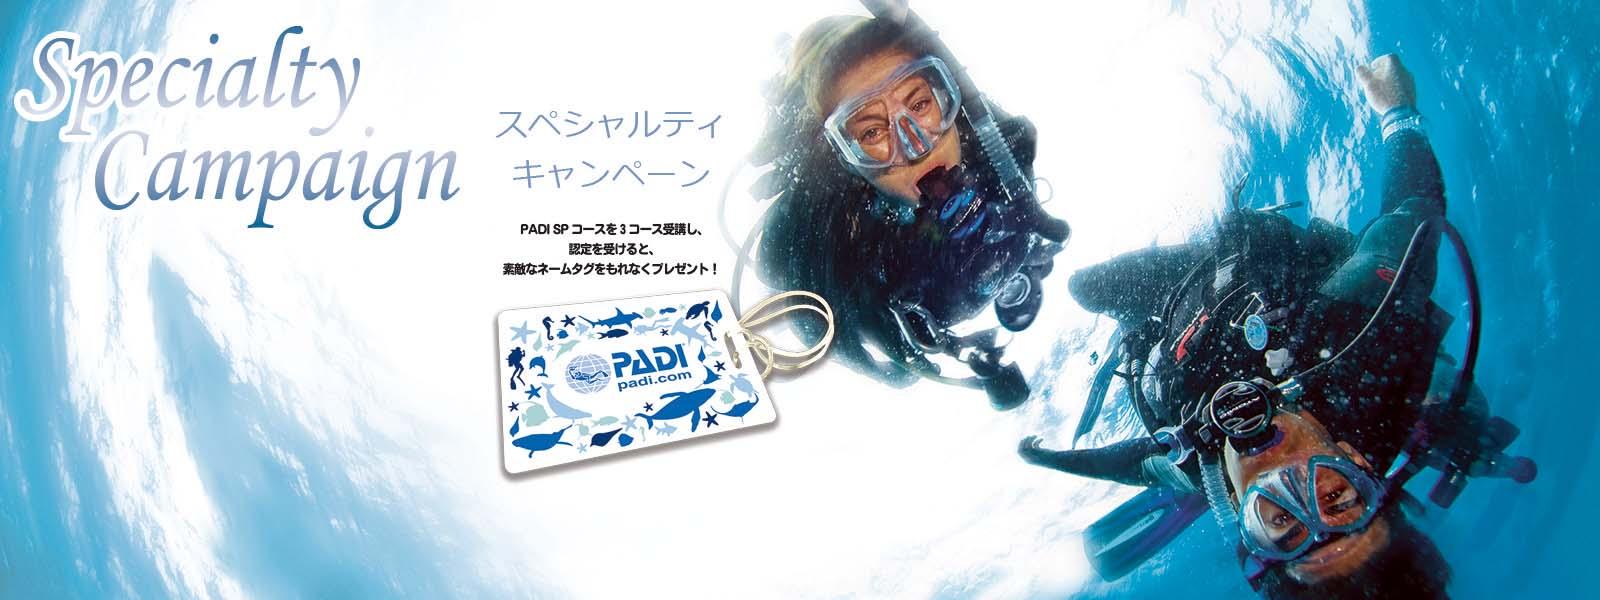 PADIスペシャルティ・キャンペーン実施中!